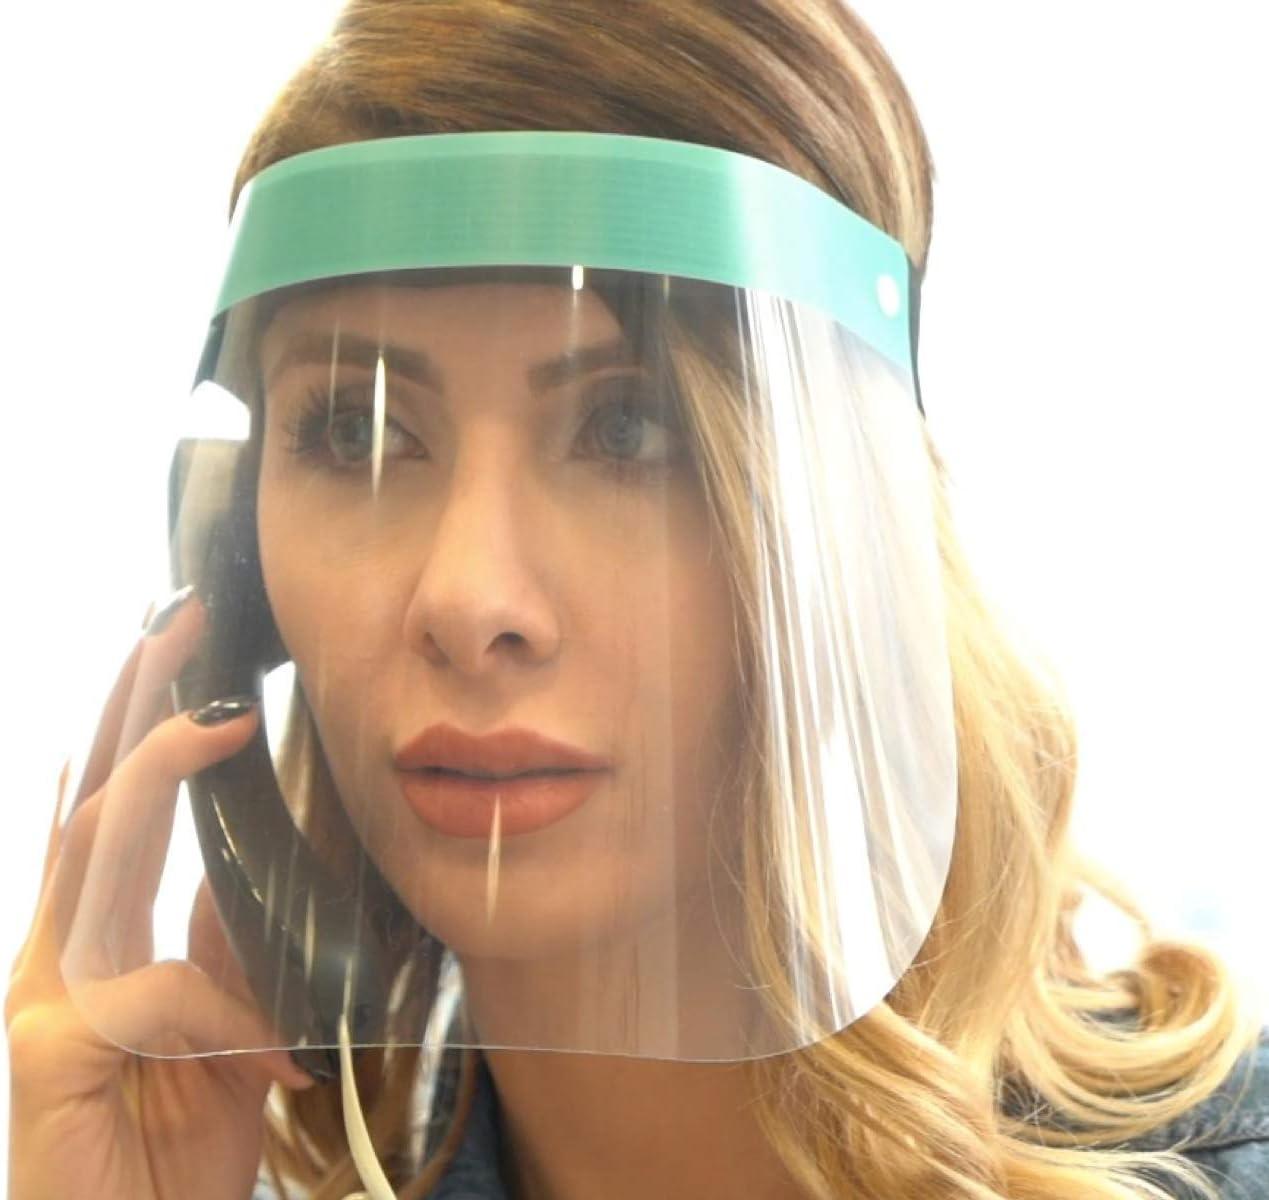 Karen – Protección facial, visera de plástico – Cara Shield – Transparente Cara Escudo con banda de goma ajustable para hombres y mujeres, fabricado en Europa